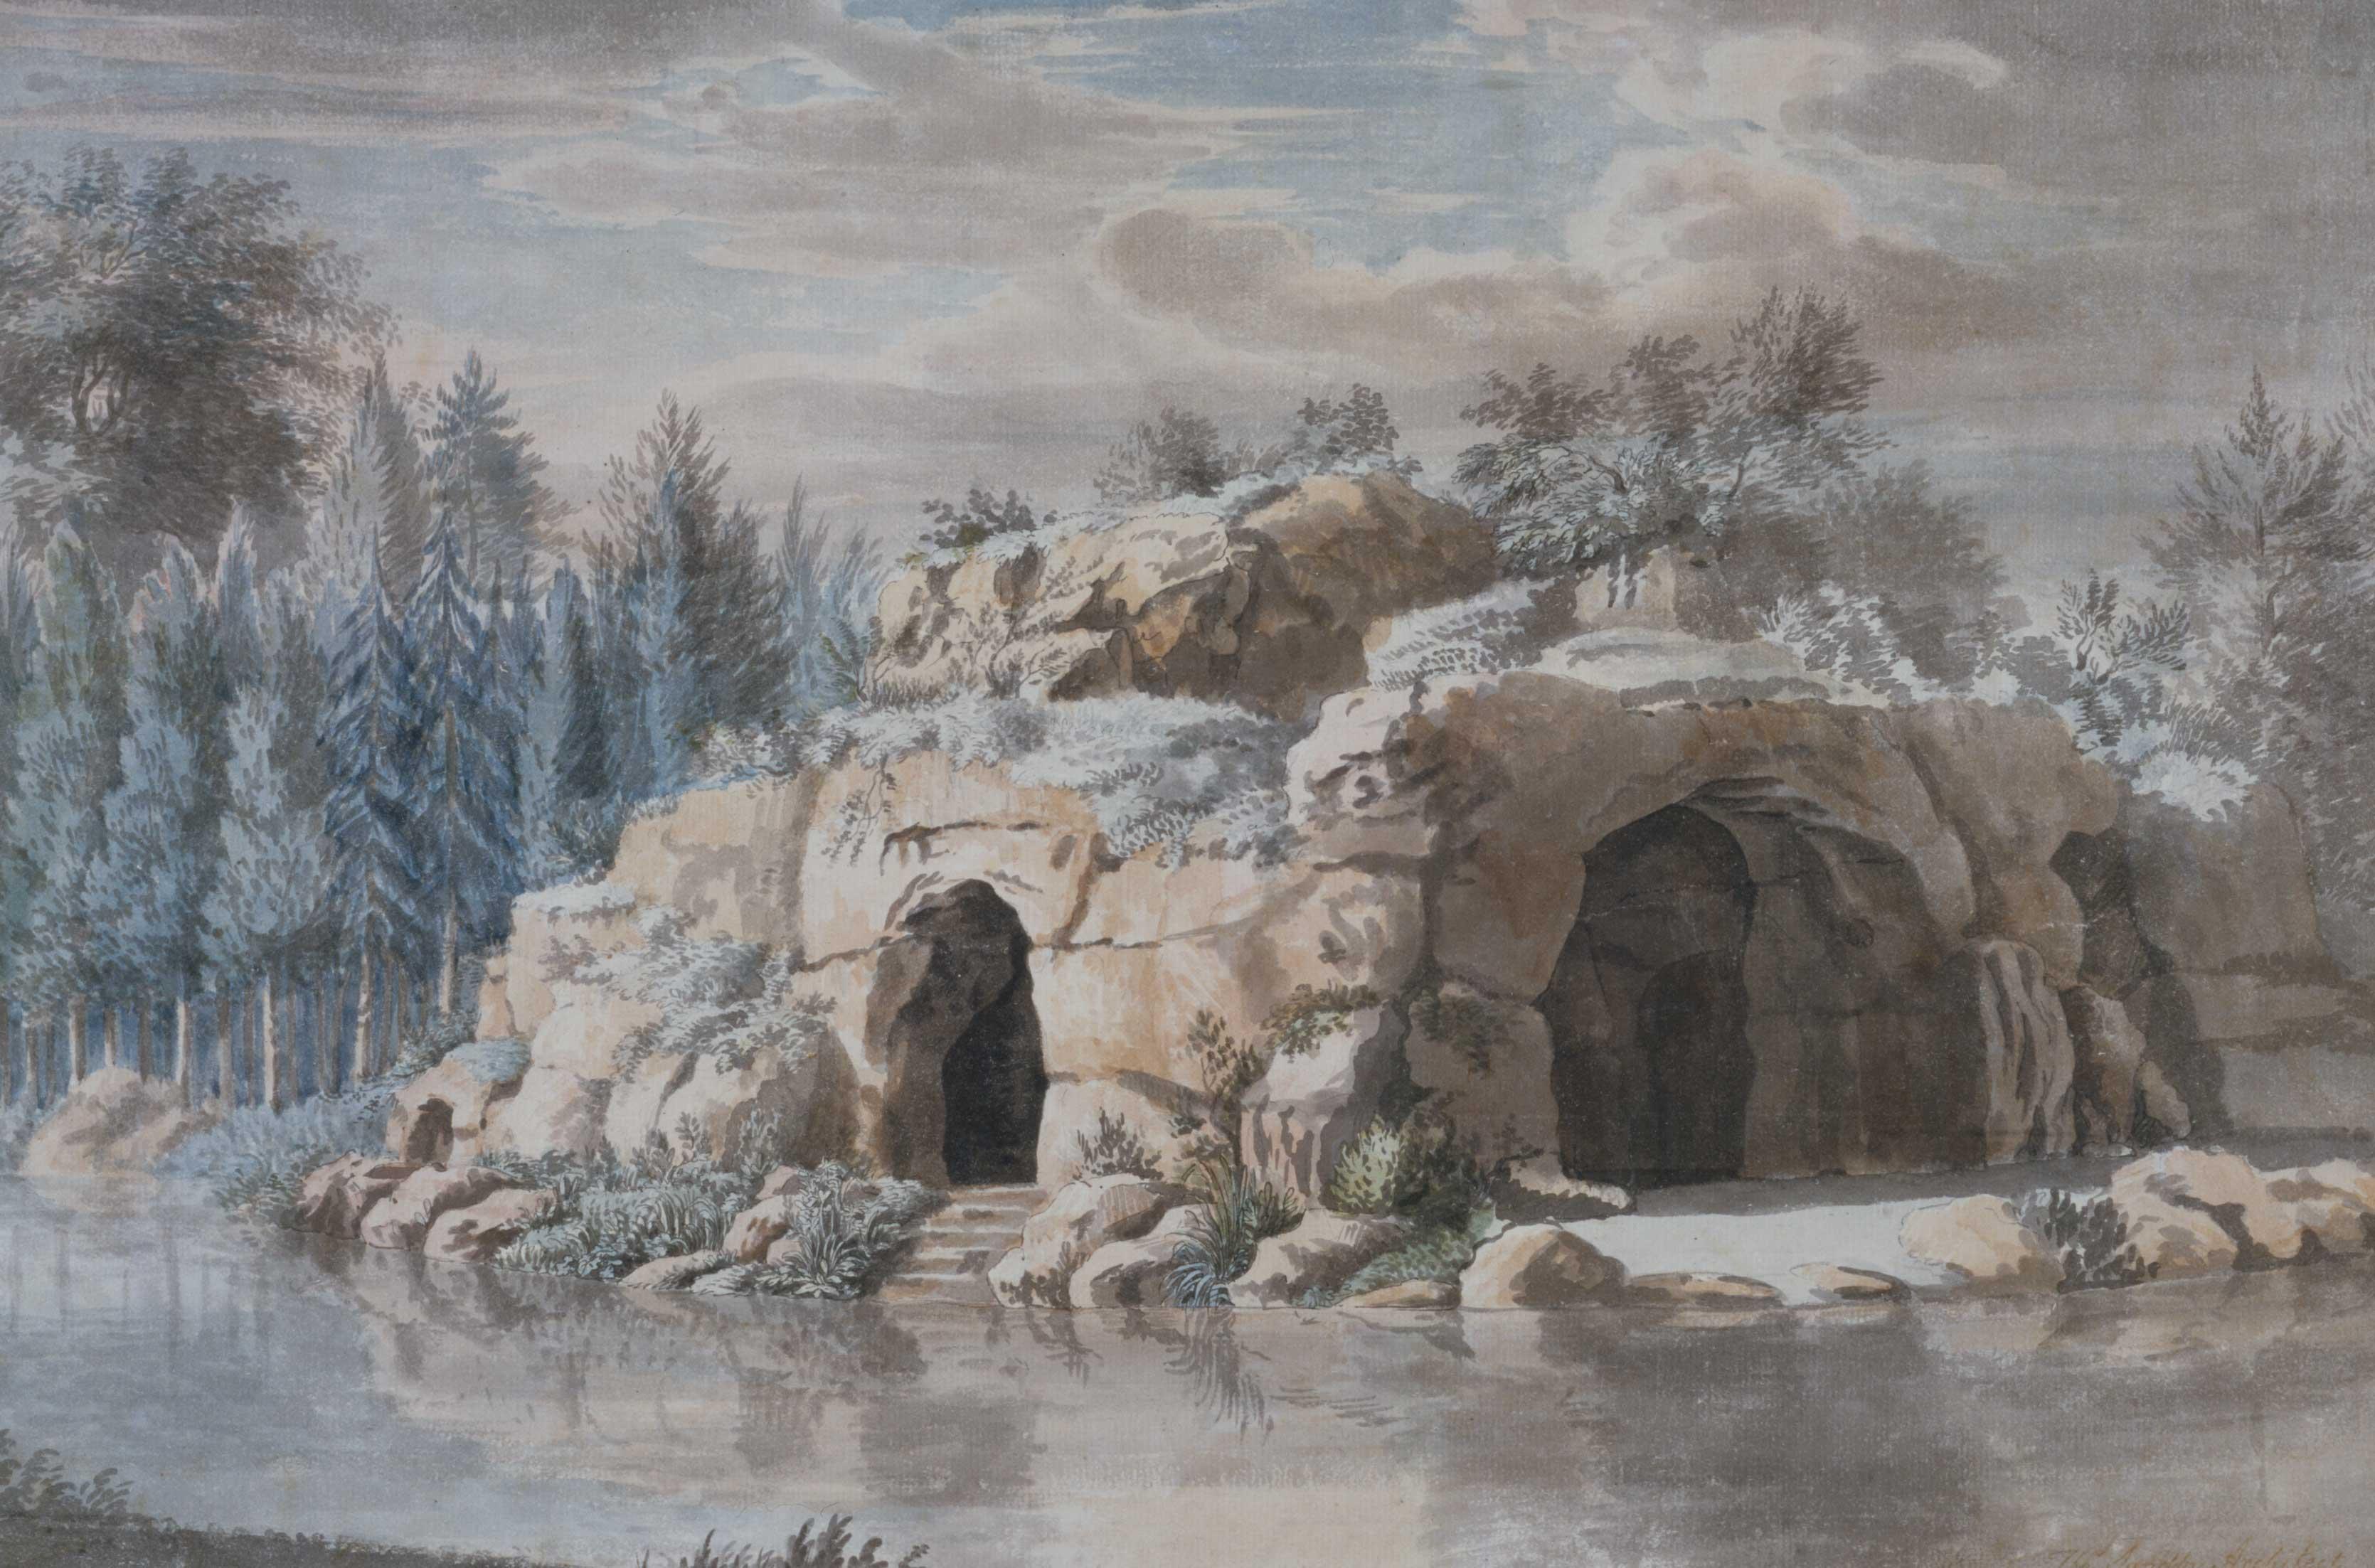 Sketch for an ornamental lake